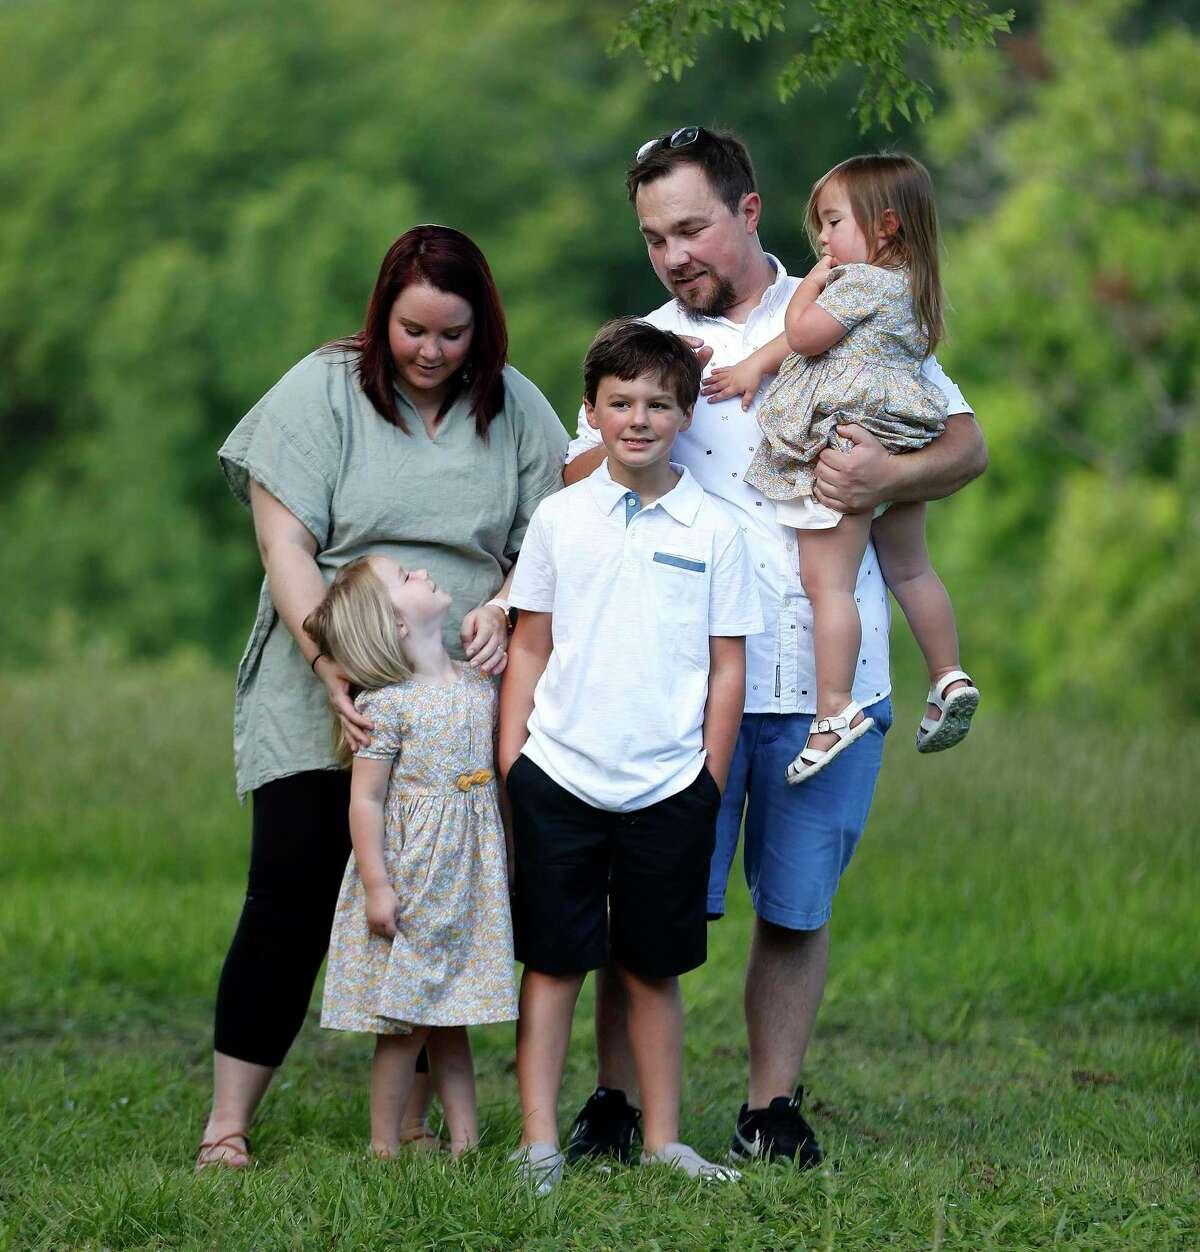 Stephanie Eldridge, with her husband, Joshua, and kids Emma, 2, Madeleine, 4, and Owen, 9, at Spotts Park, Saturday, July 18, 2020, in Houston.